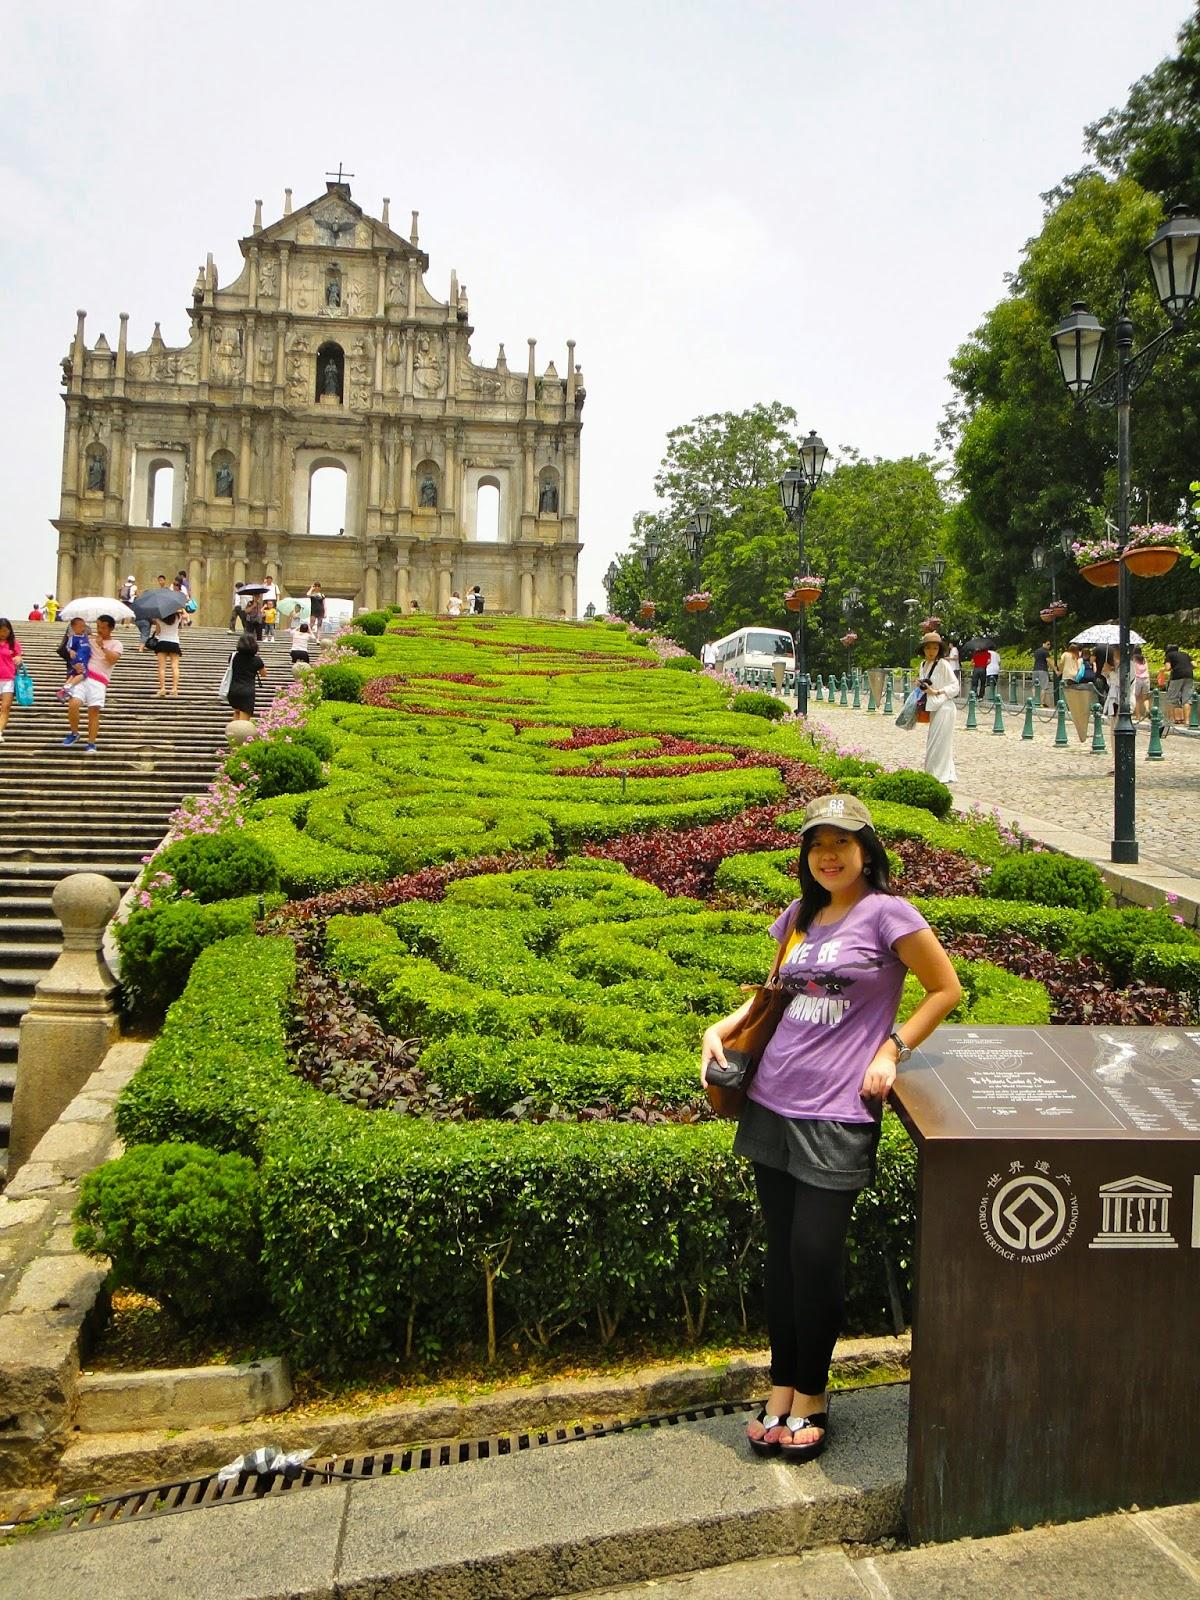 Stairs to St Paul Ruins at Macau